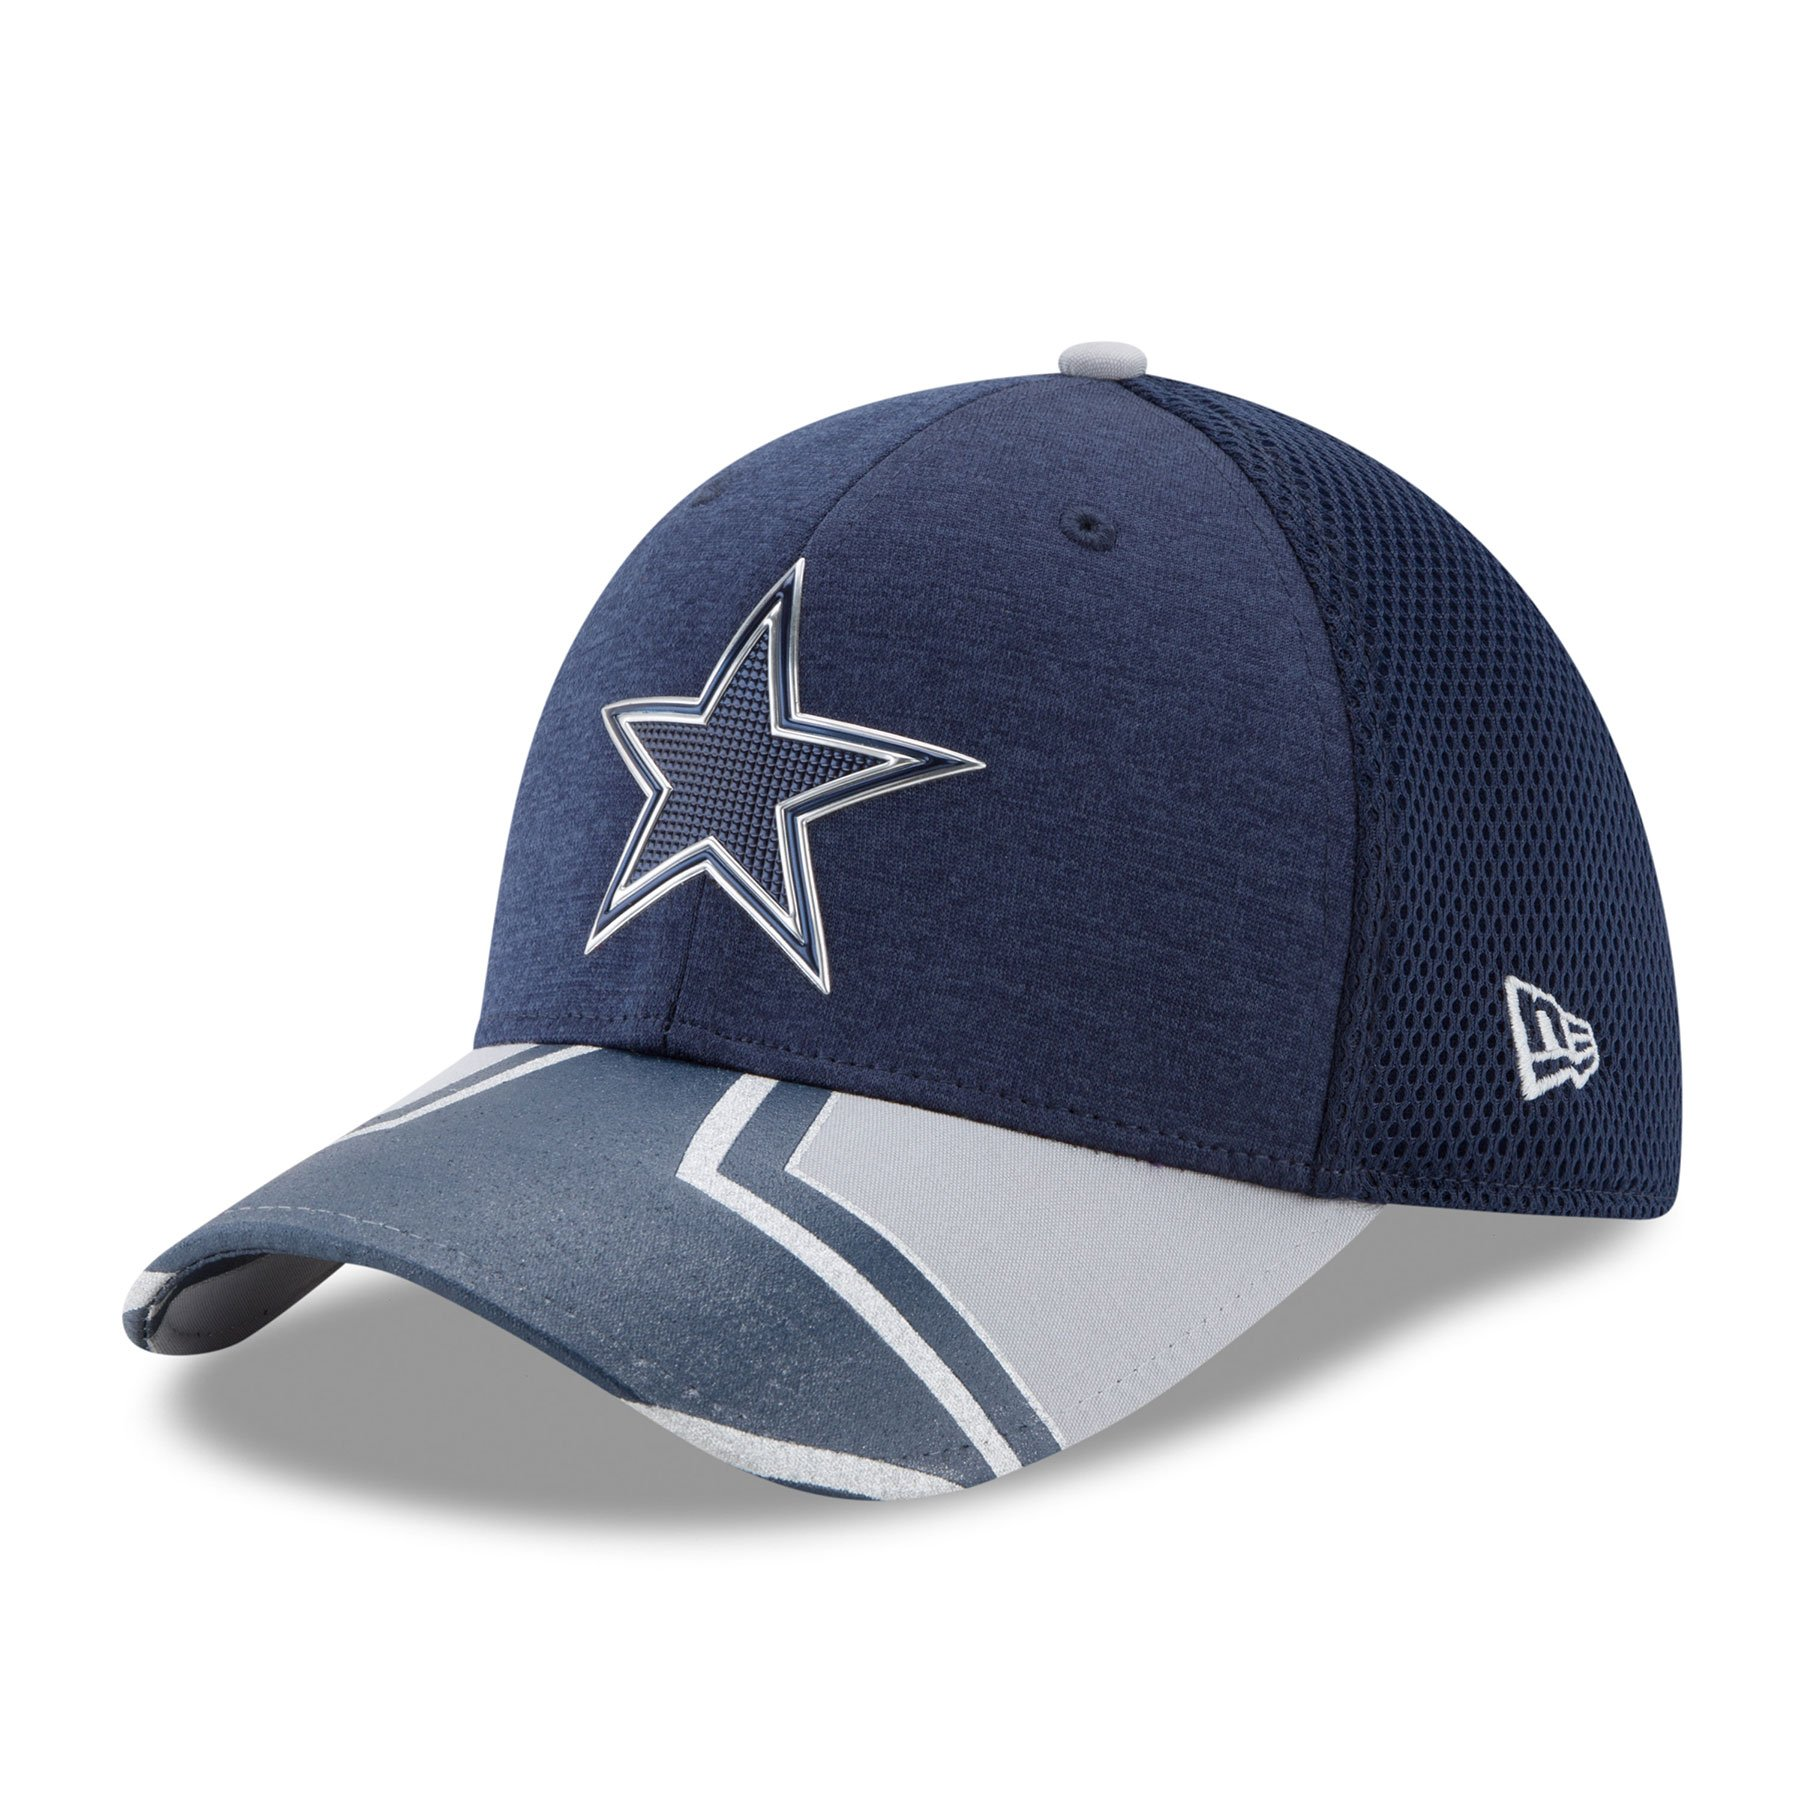 NFL Cowboys: Amazon.de